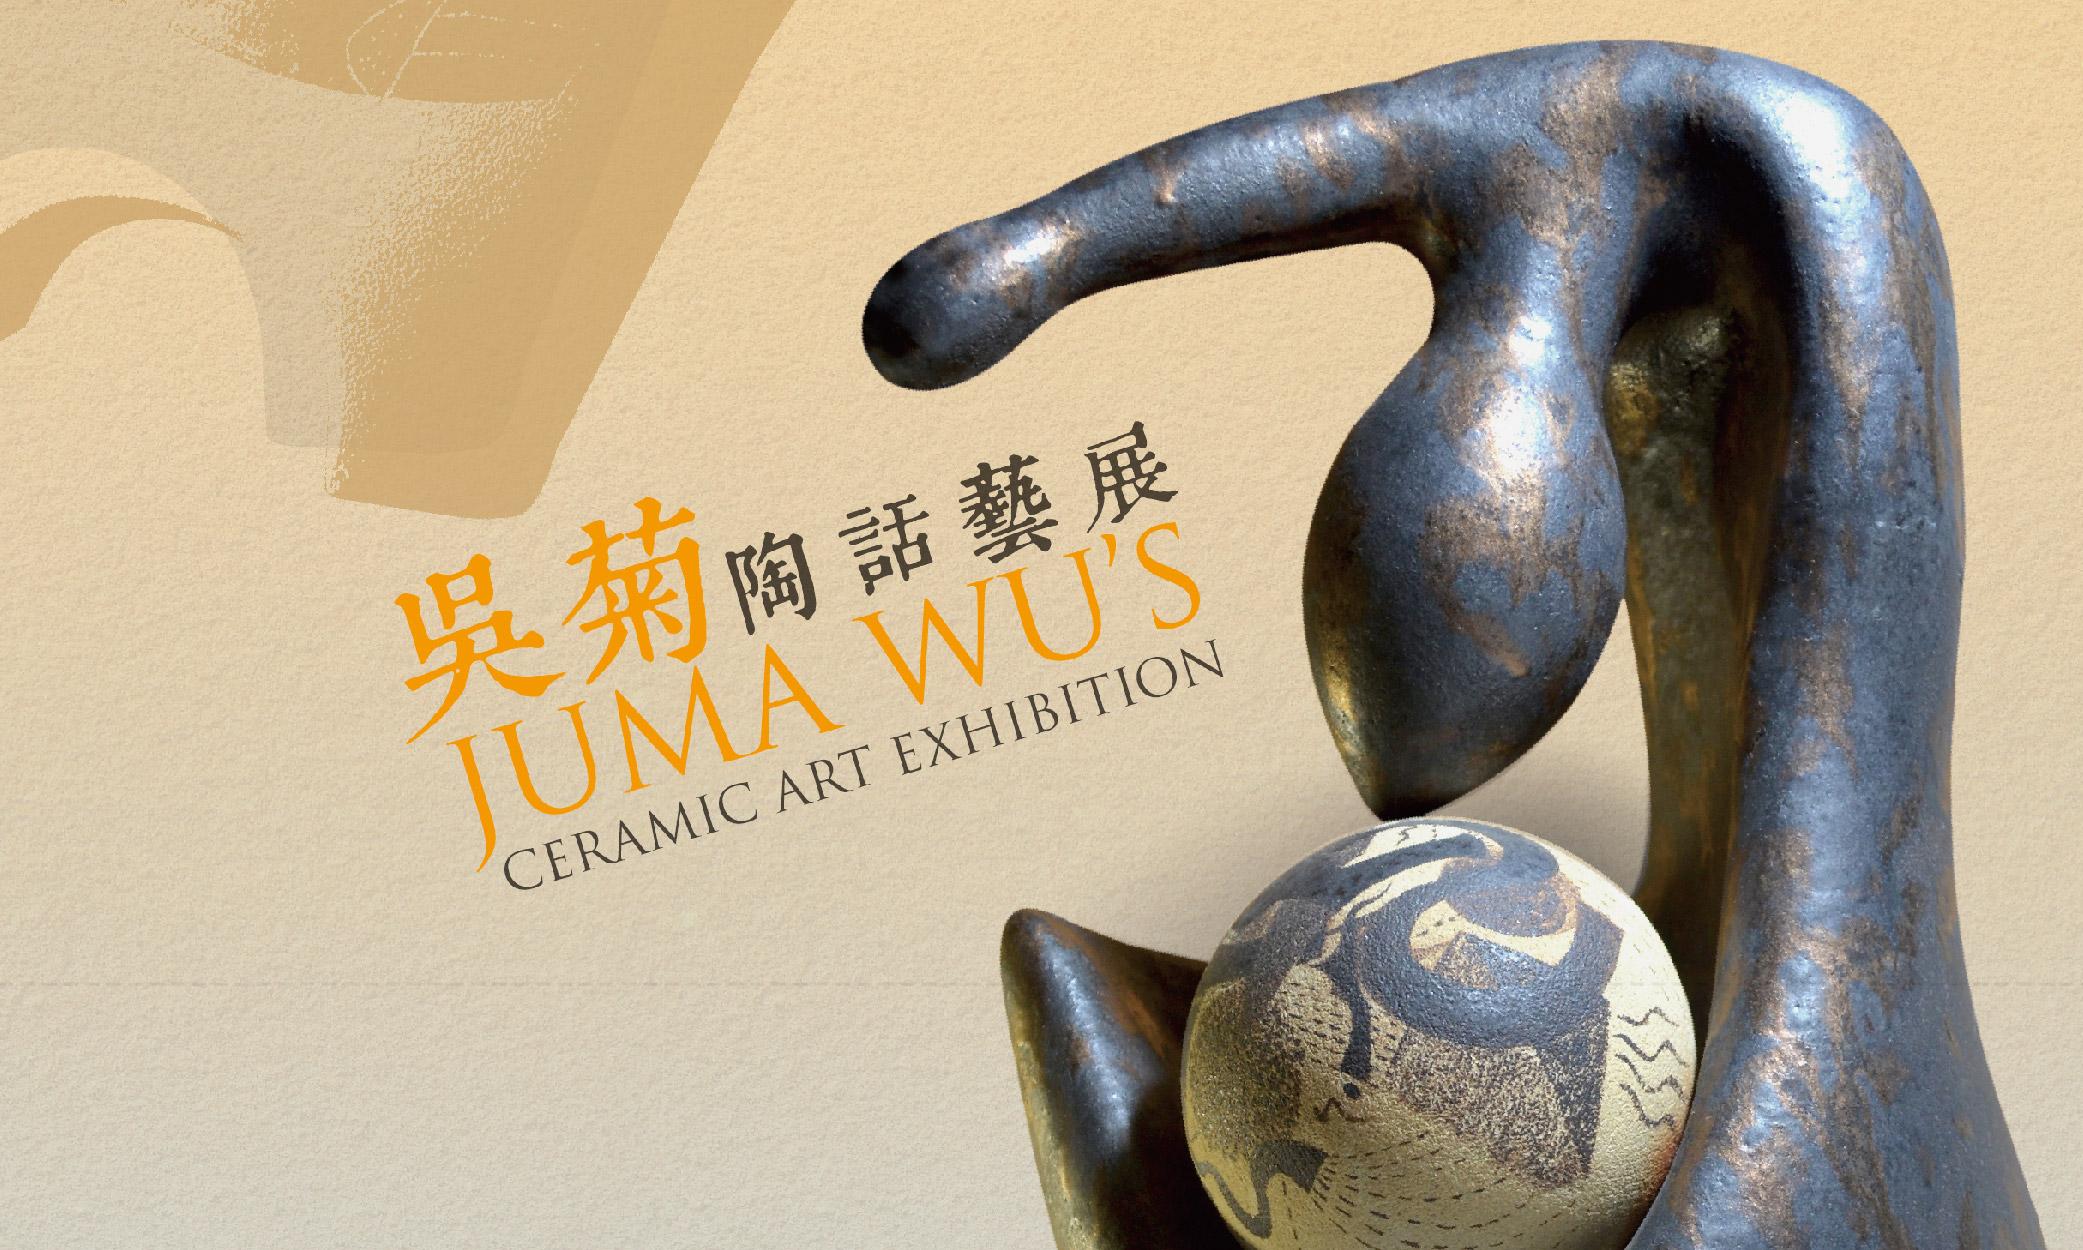 Juma Wu's Ceramic Art Exhibition